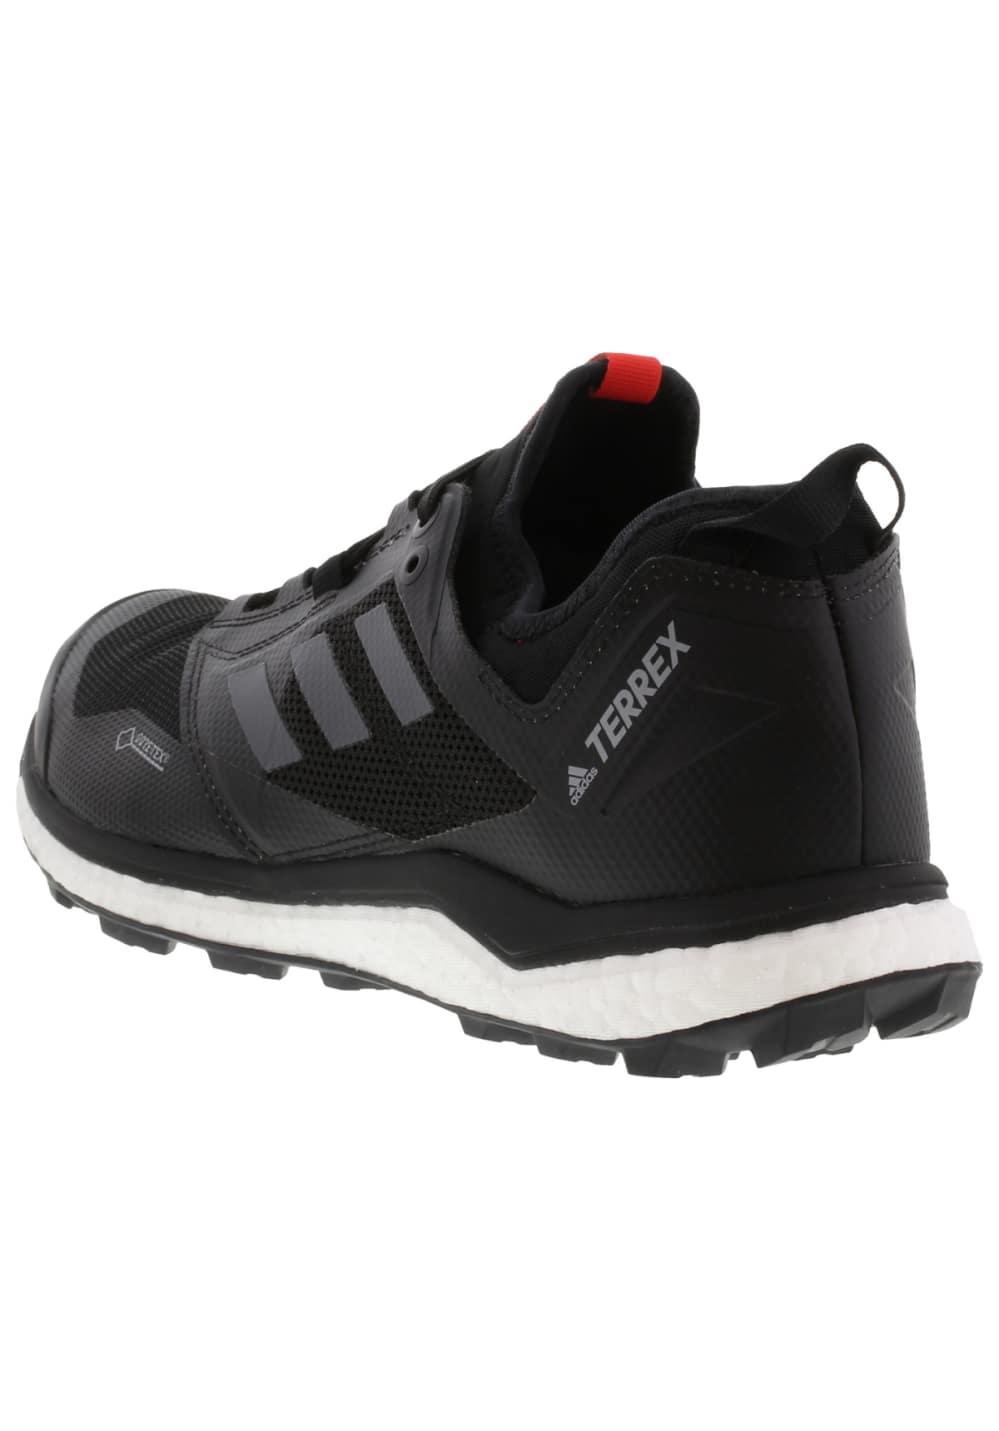 d94f874d7 adidas TERREX Terrex Agravic Xt Gtx - Outdoor shoes for Men - Black